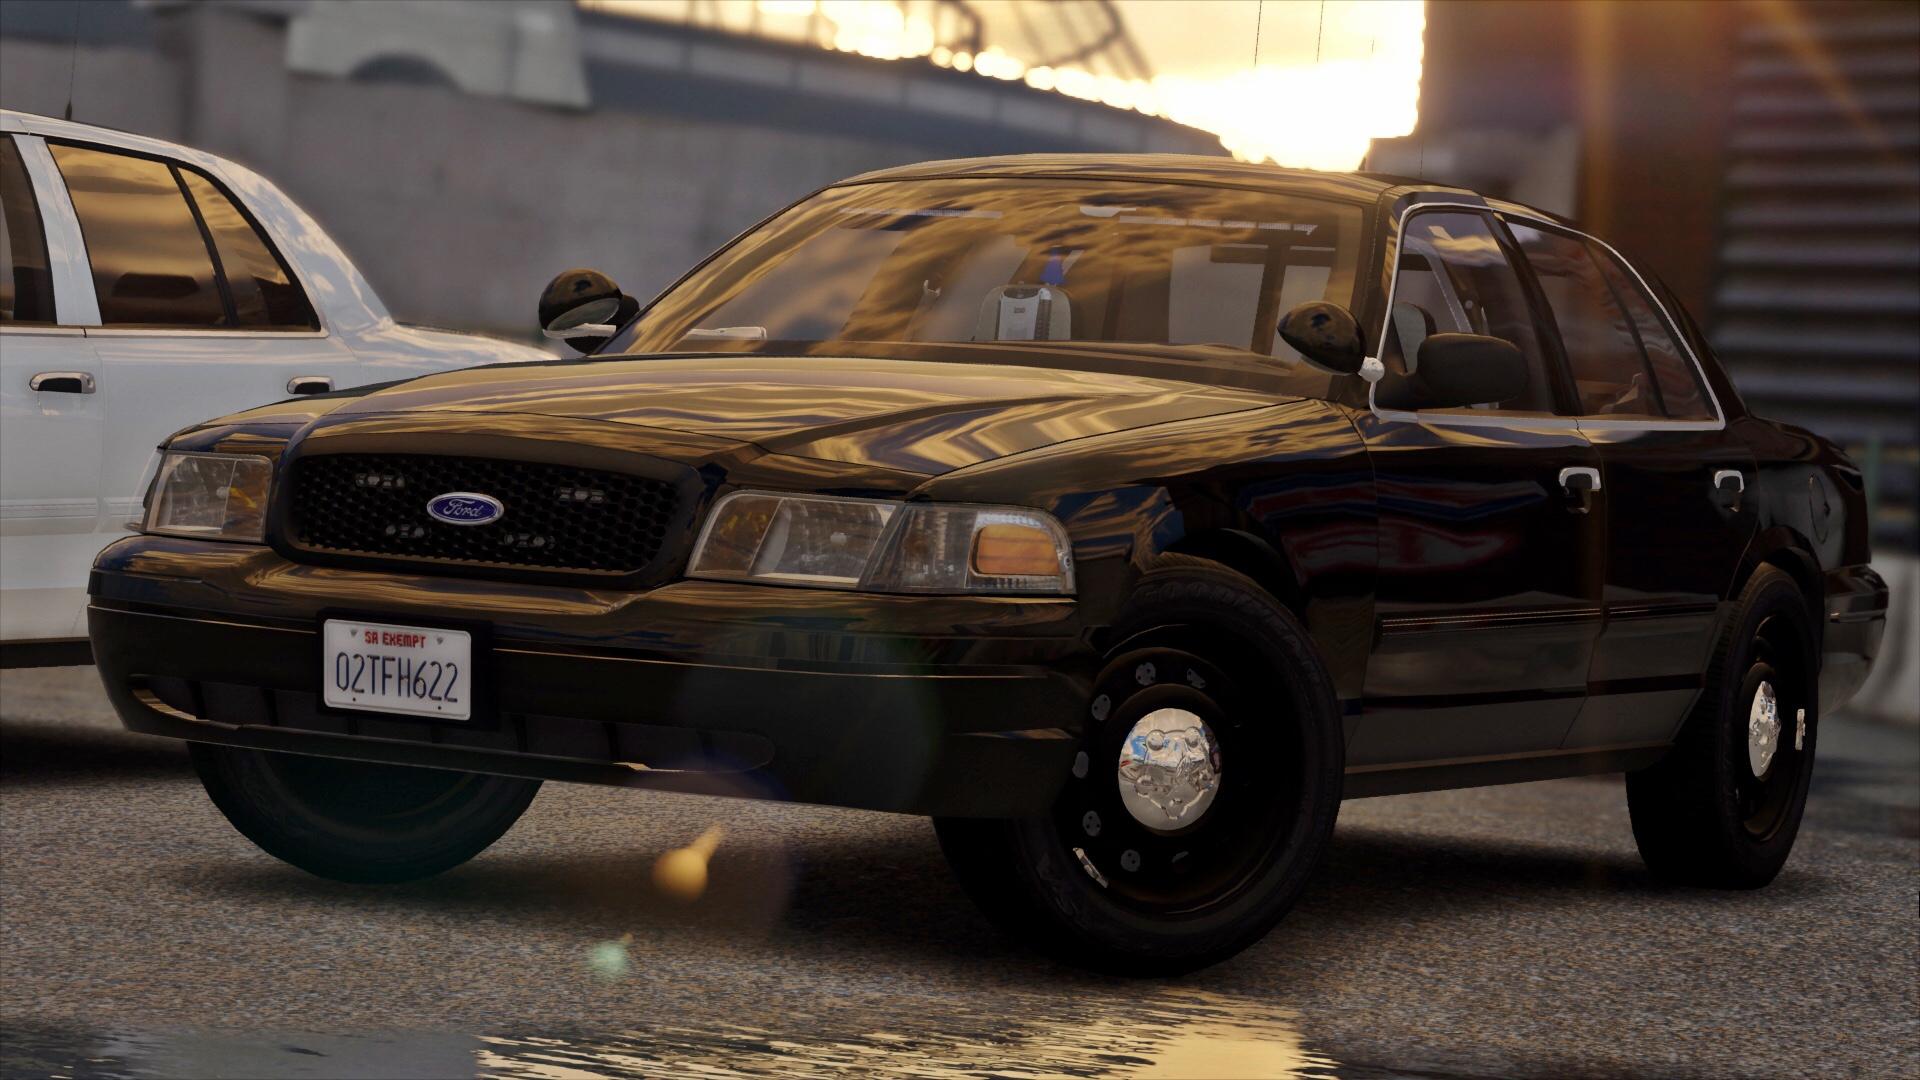 2010 Unmarked Crown Victoria Police Interceptor Els Gta5 Mods Com